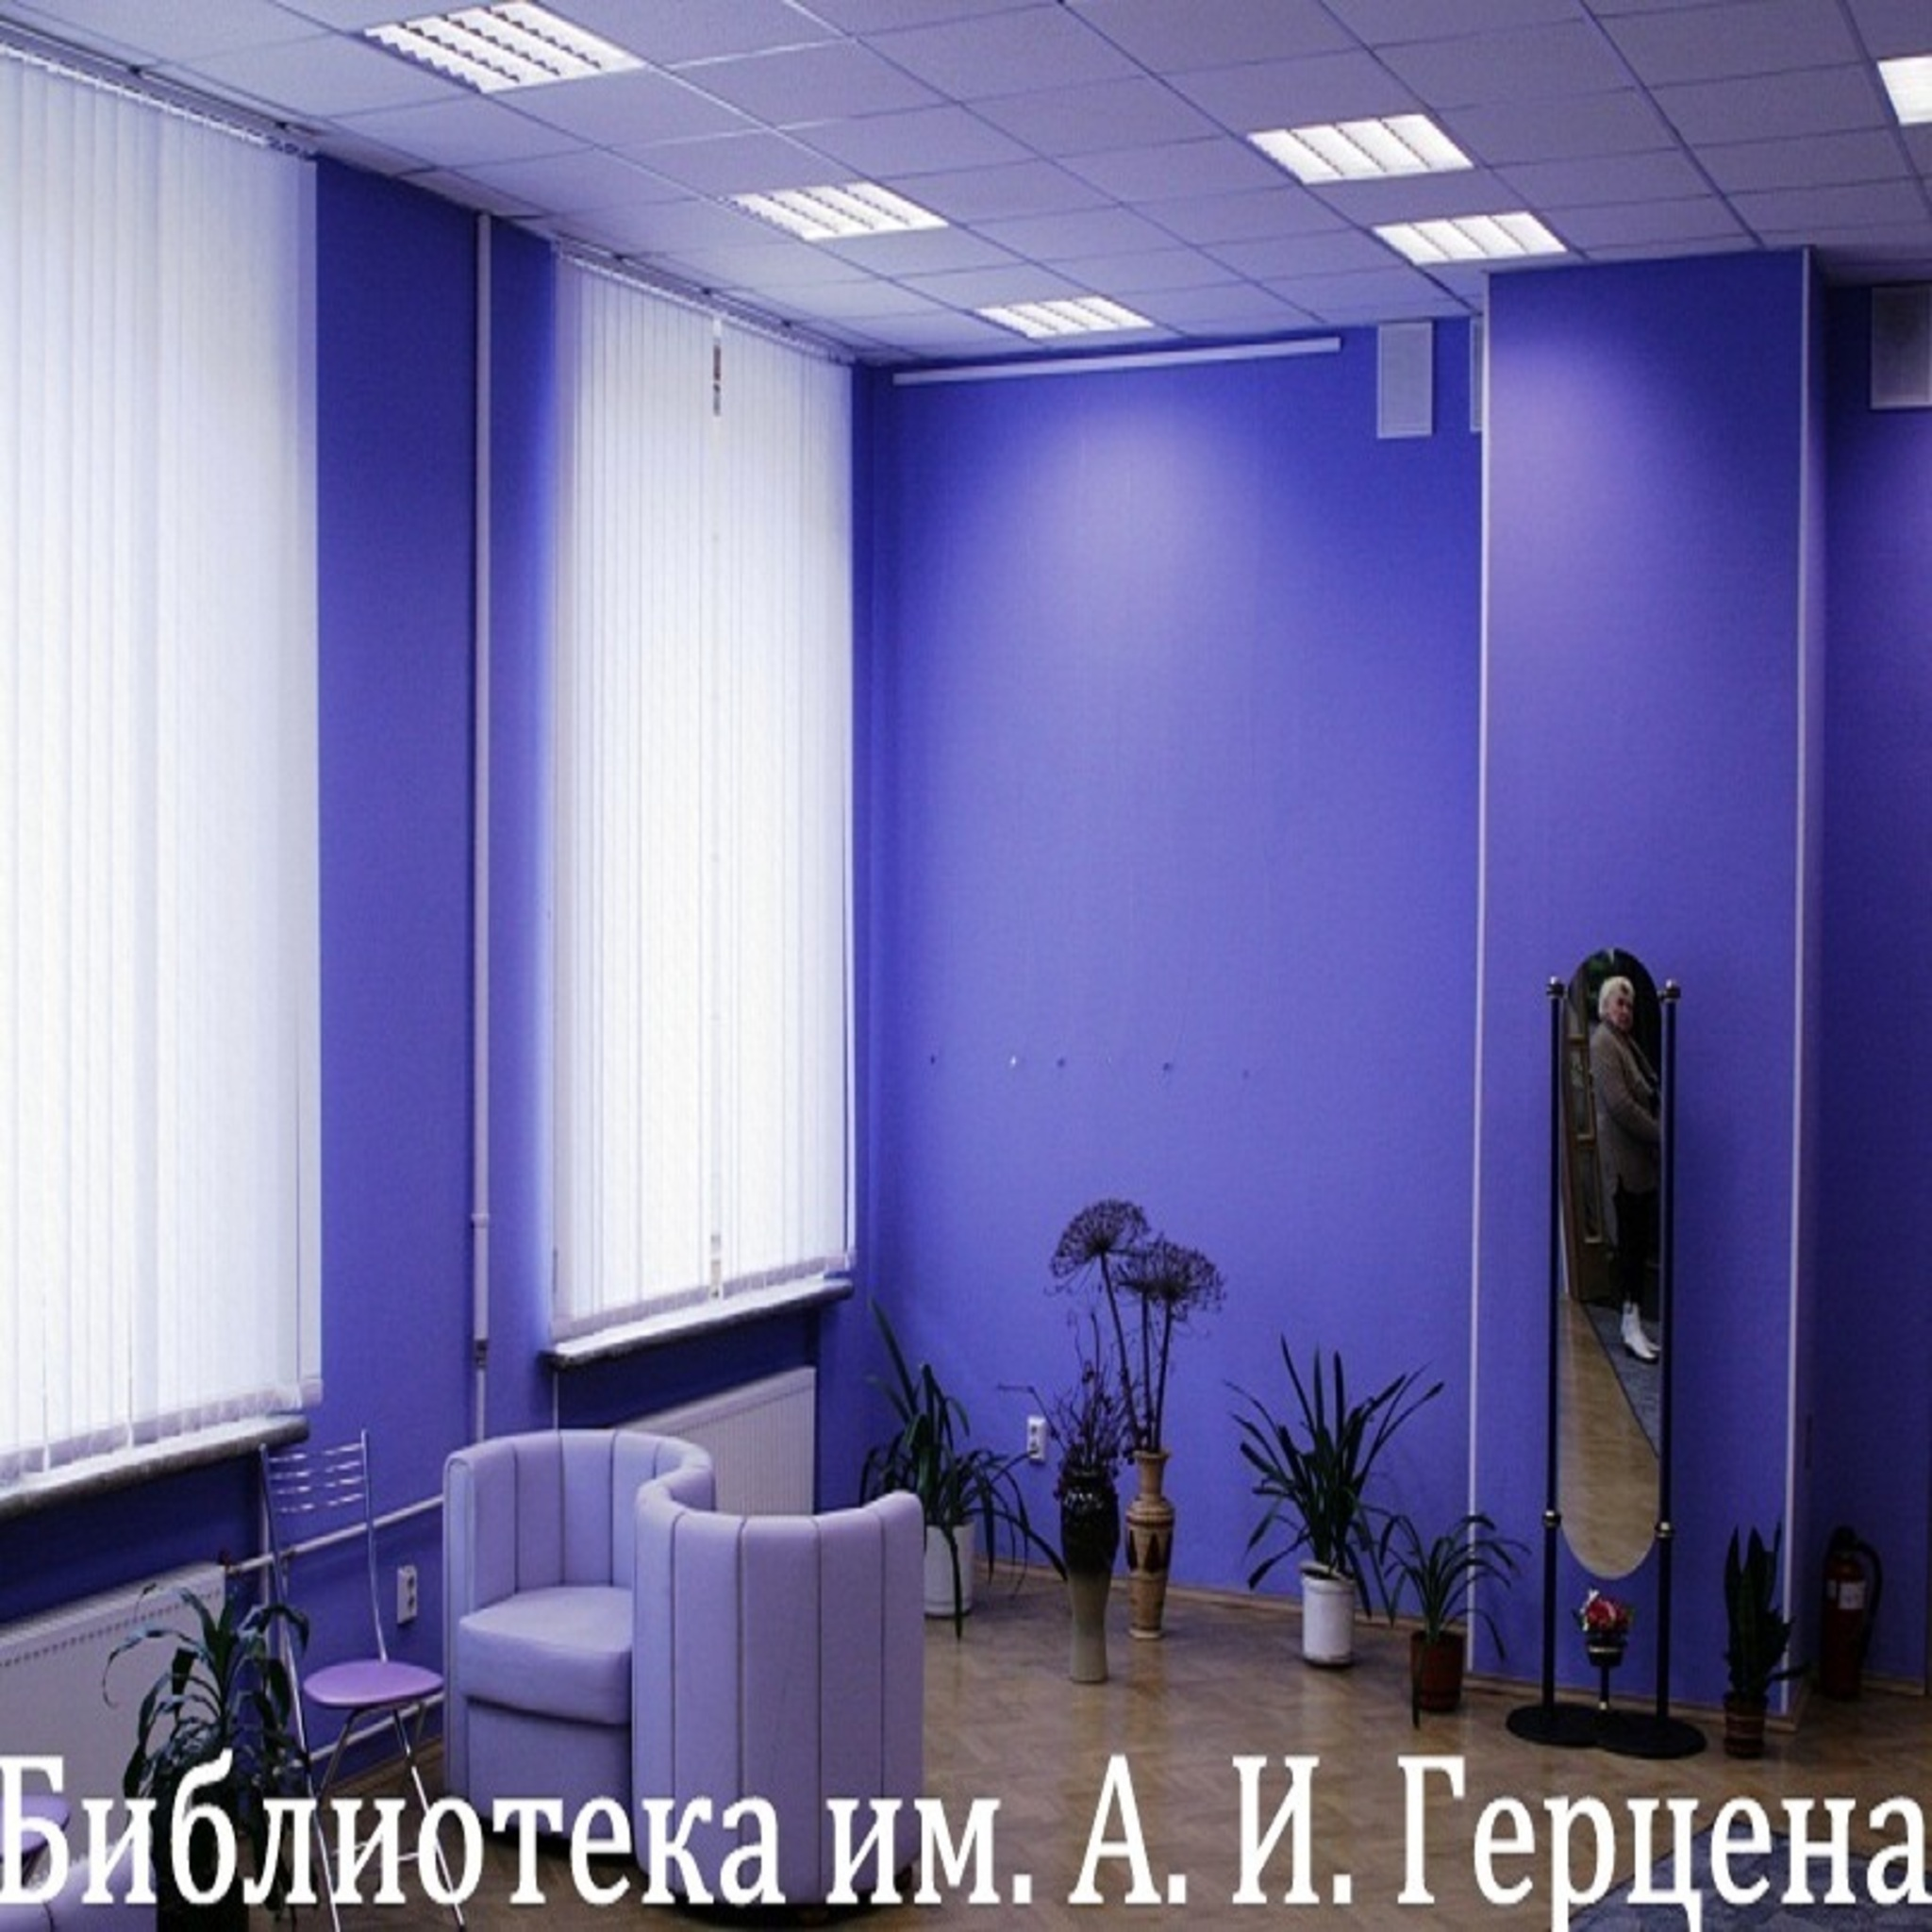 Библиотека им. А. И. Герцена